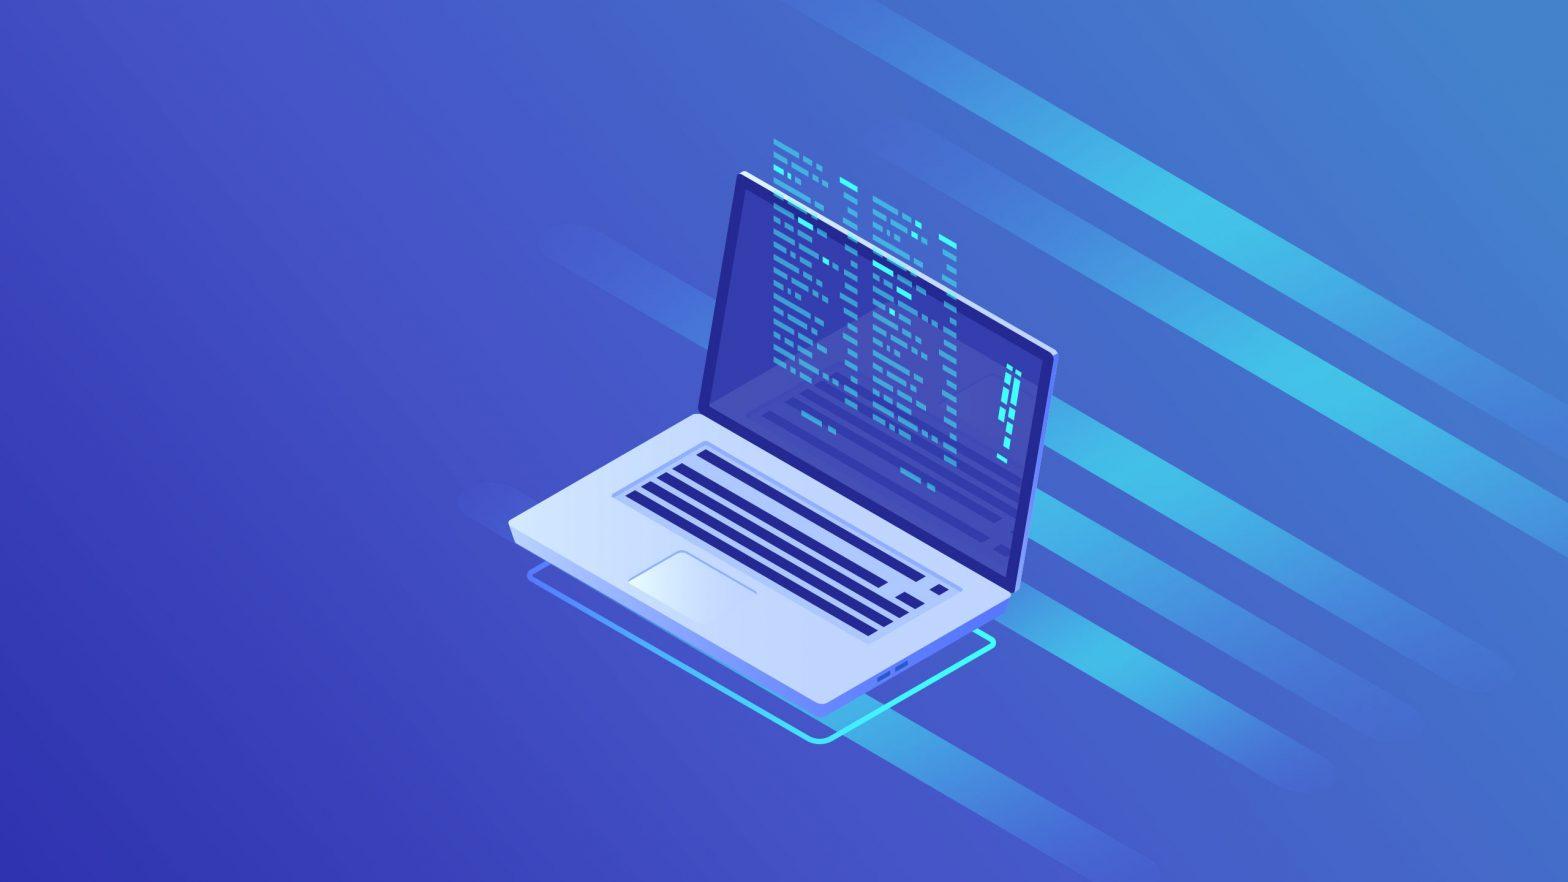 How fast should my website load? - Website performance optimisation explained